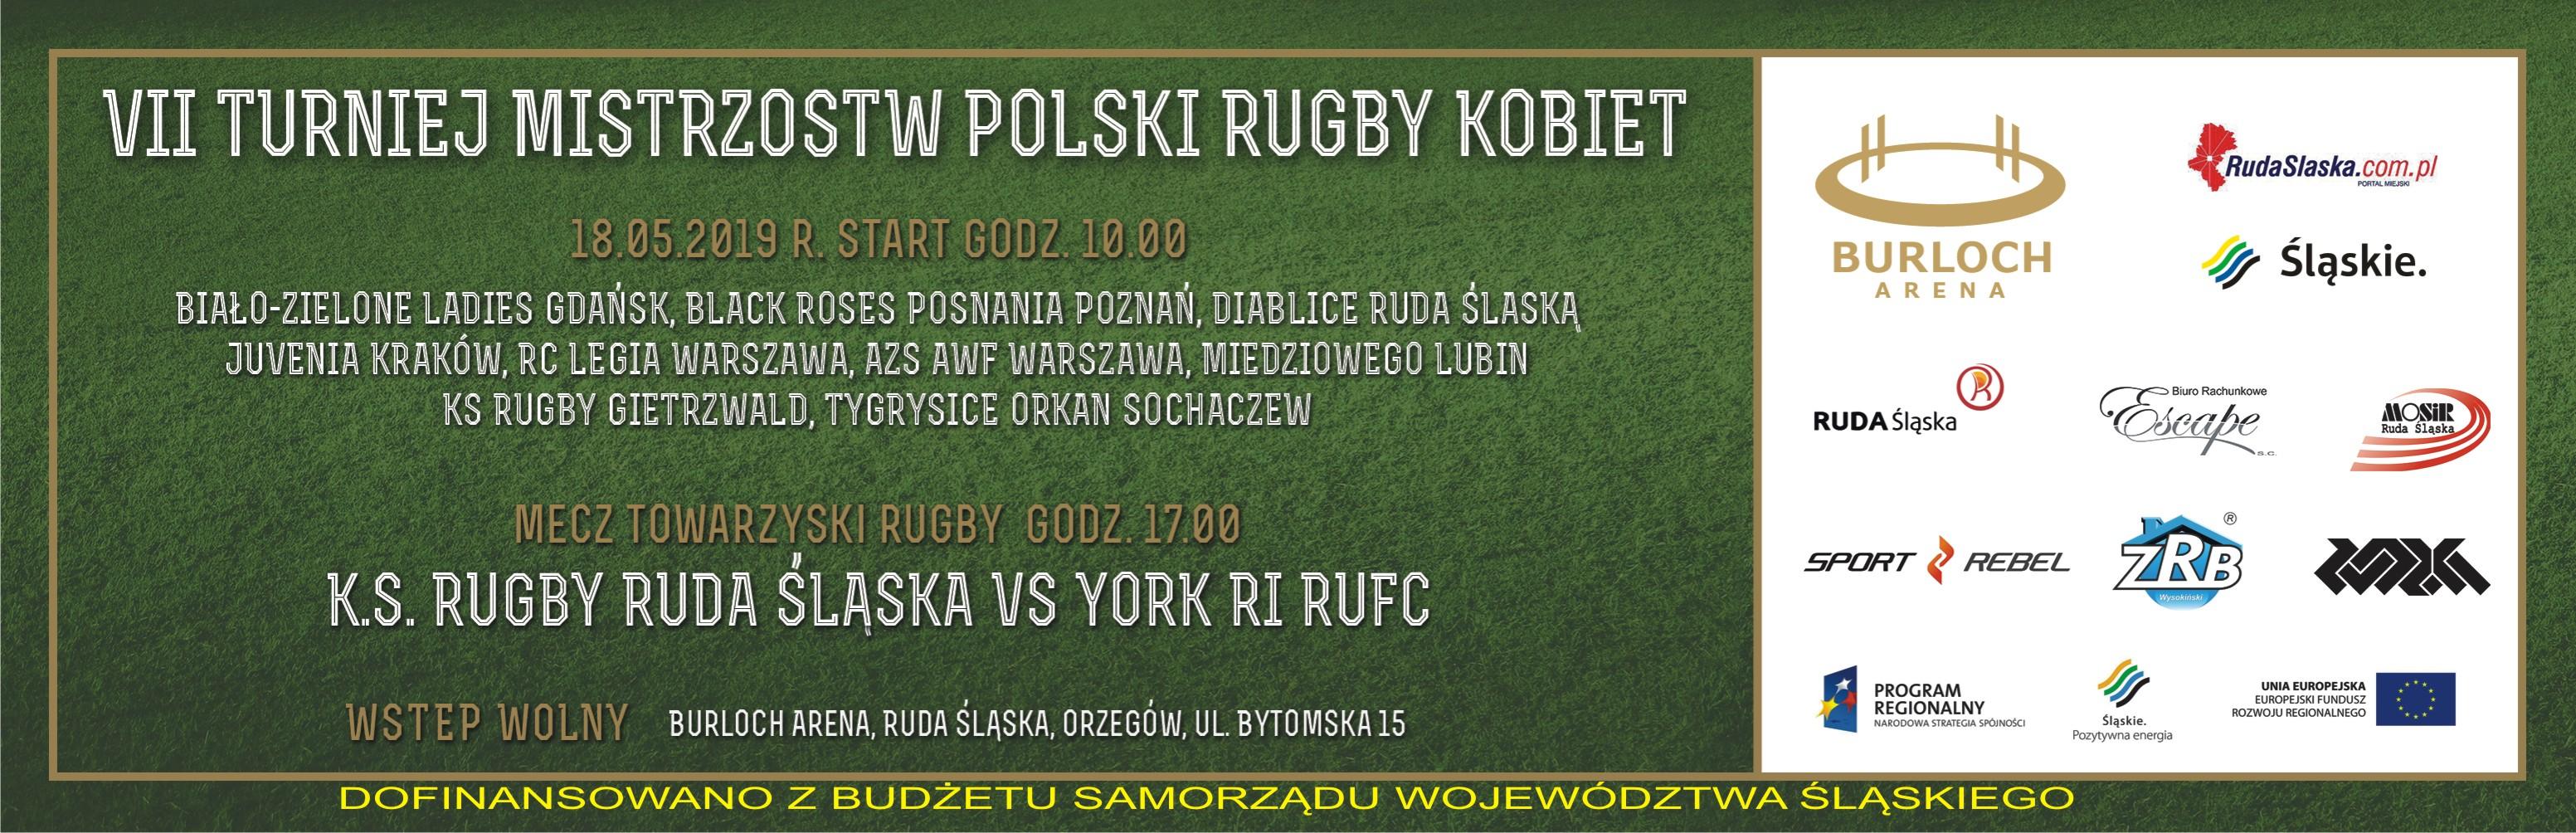 Diablice Rugby Ruda śląska Diablice Drużyna żeńska Klubu